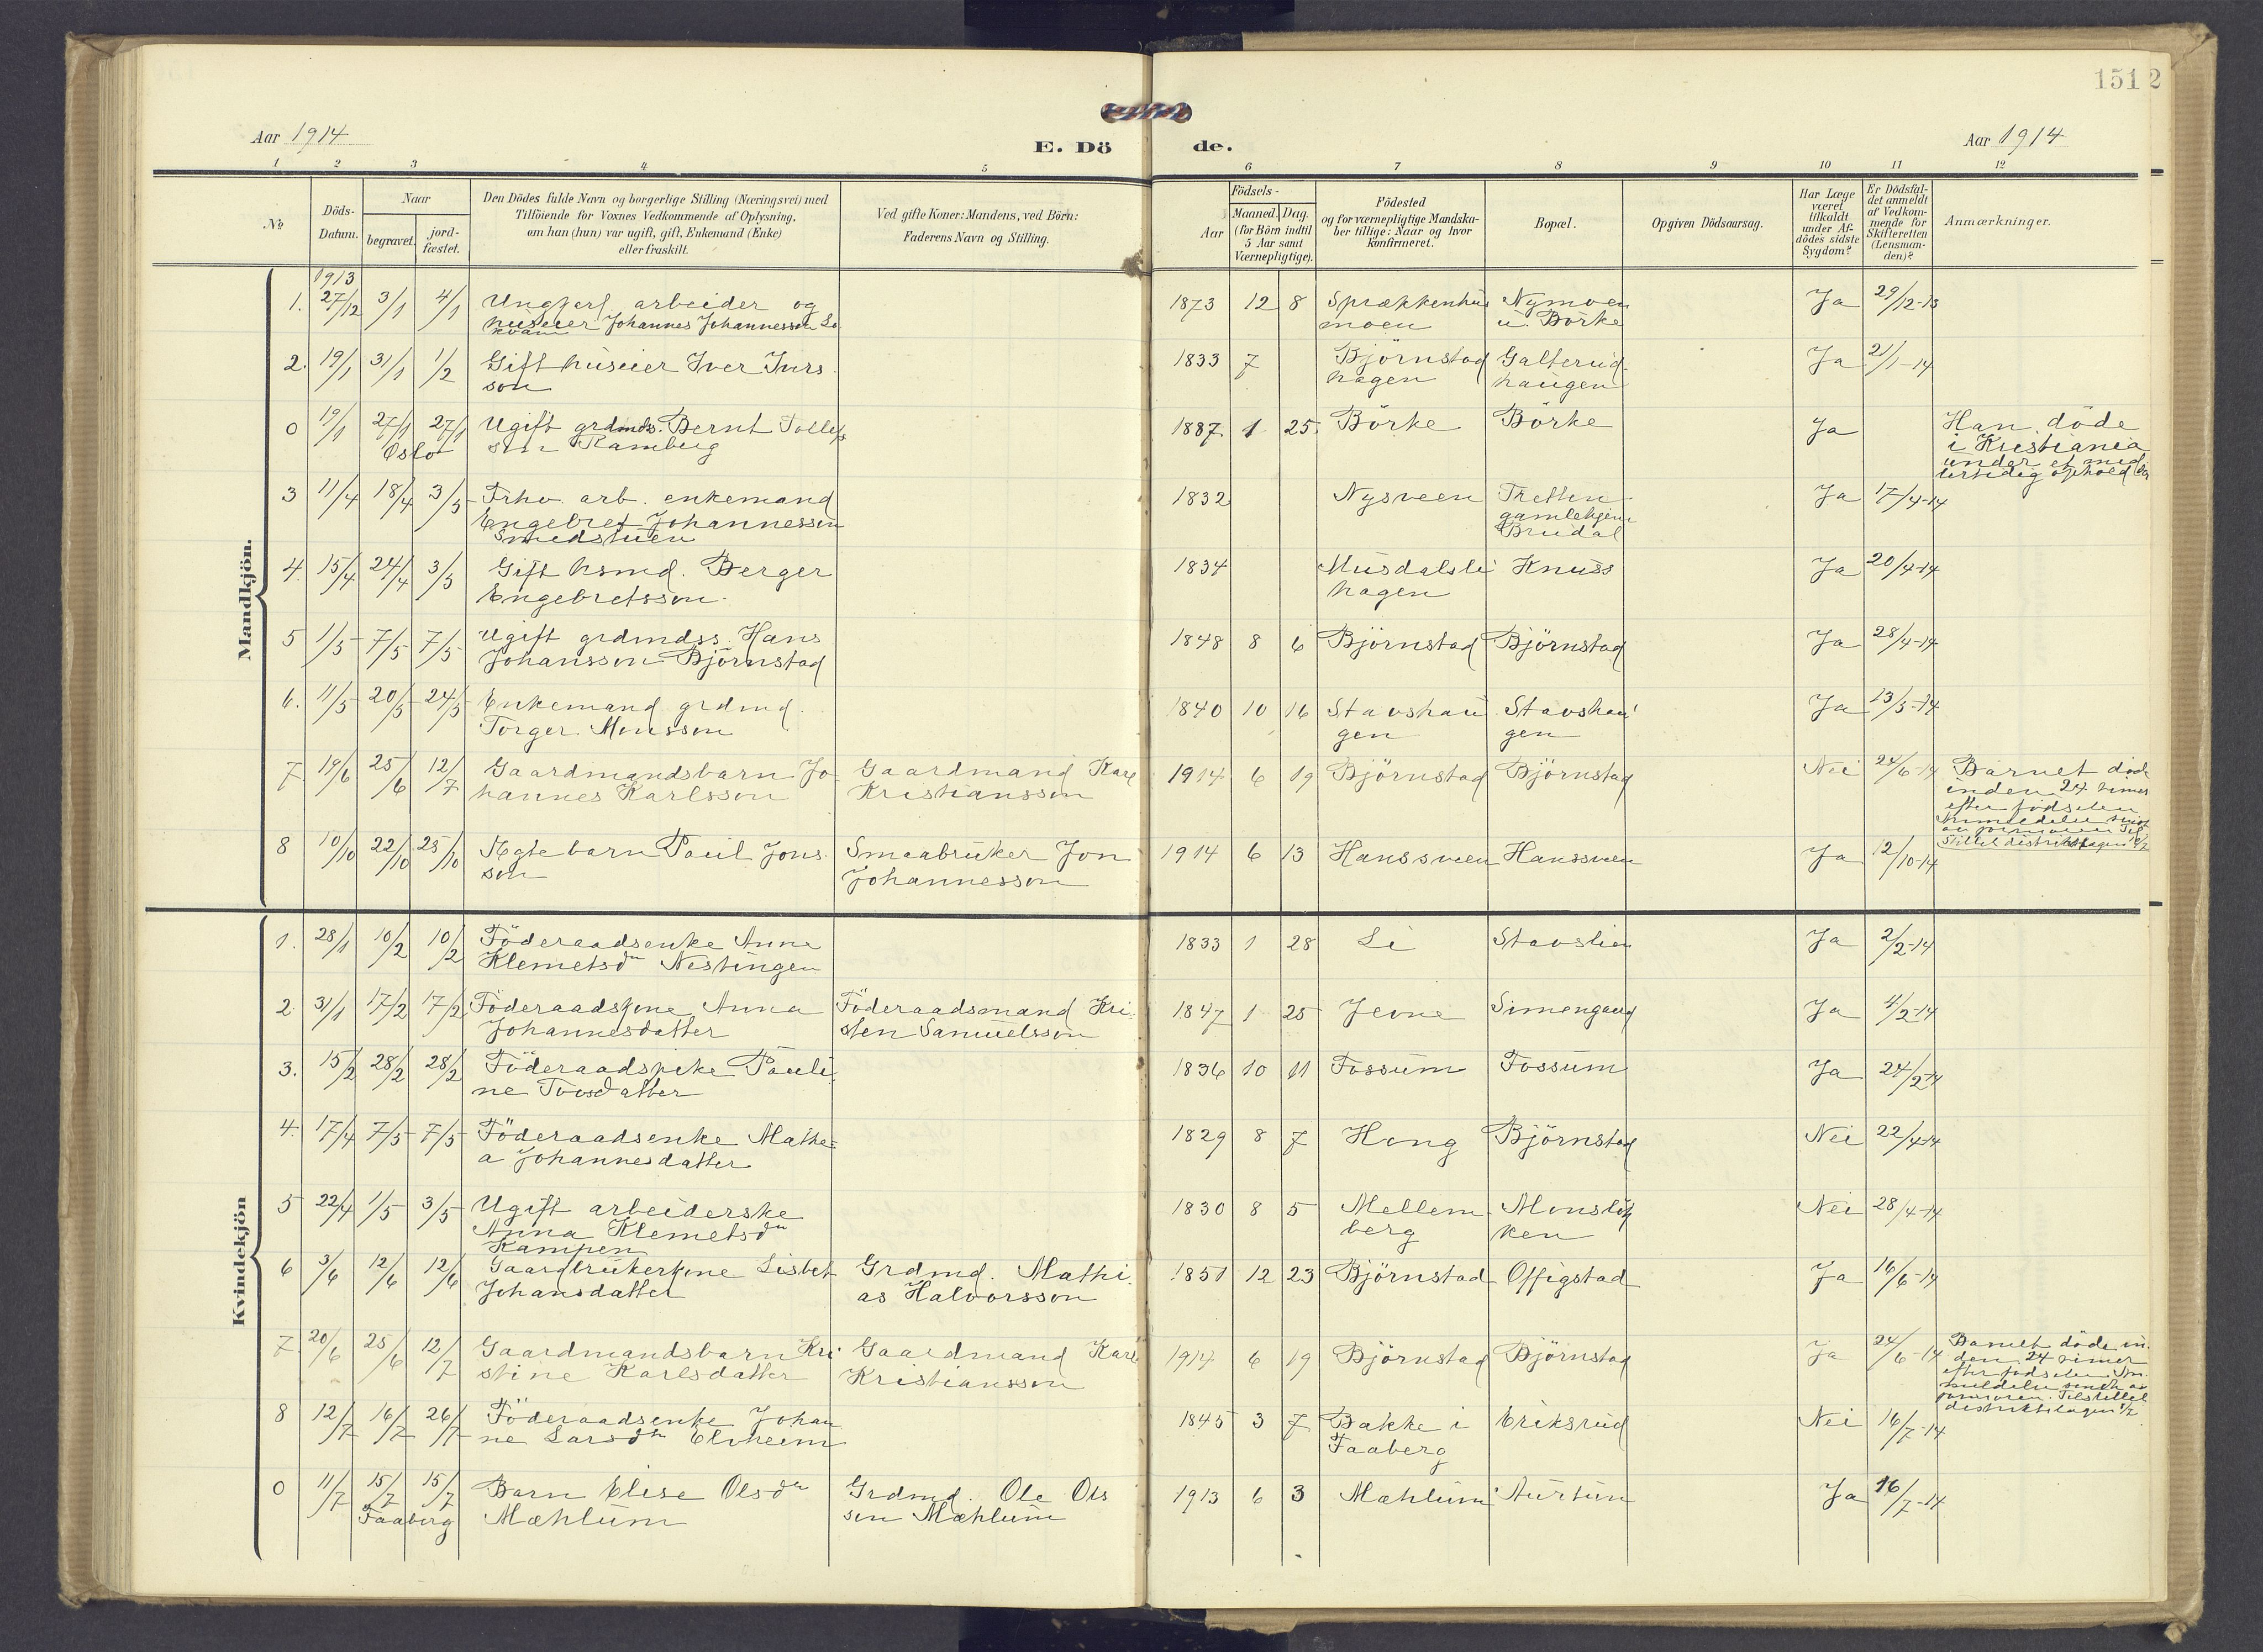 SAH, Øyer prestekontor, Ministerialbok nr. 13, 1905-1920, s. 151